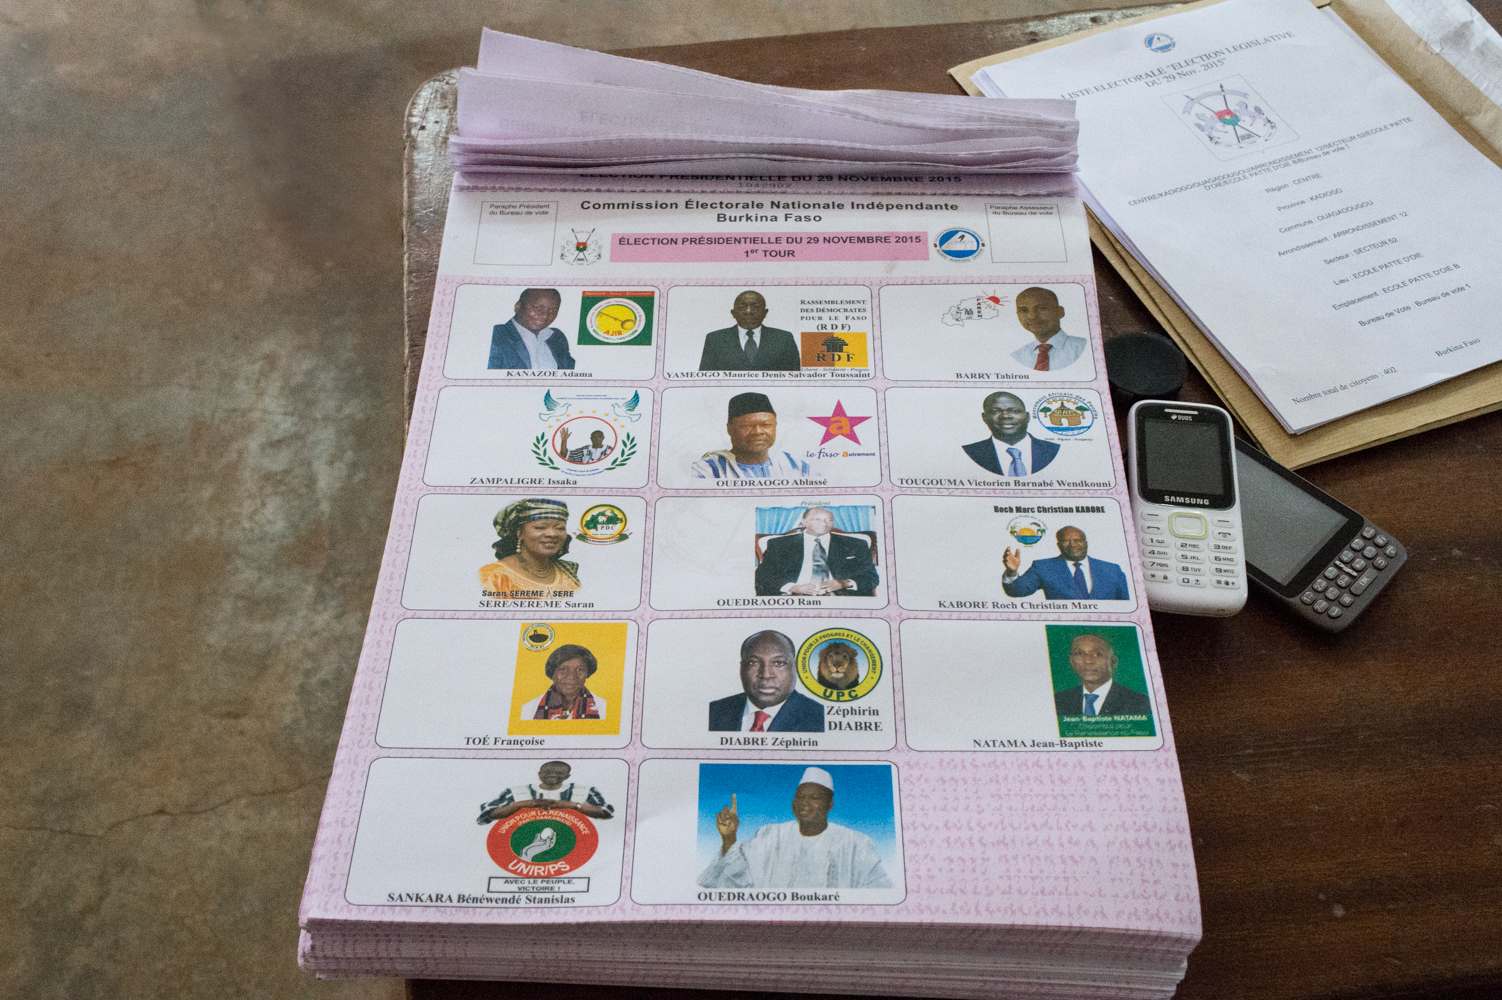 election_presidentielle_burkina_faso_2015_roch_kabore-14